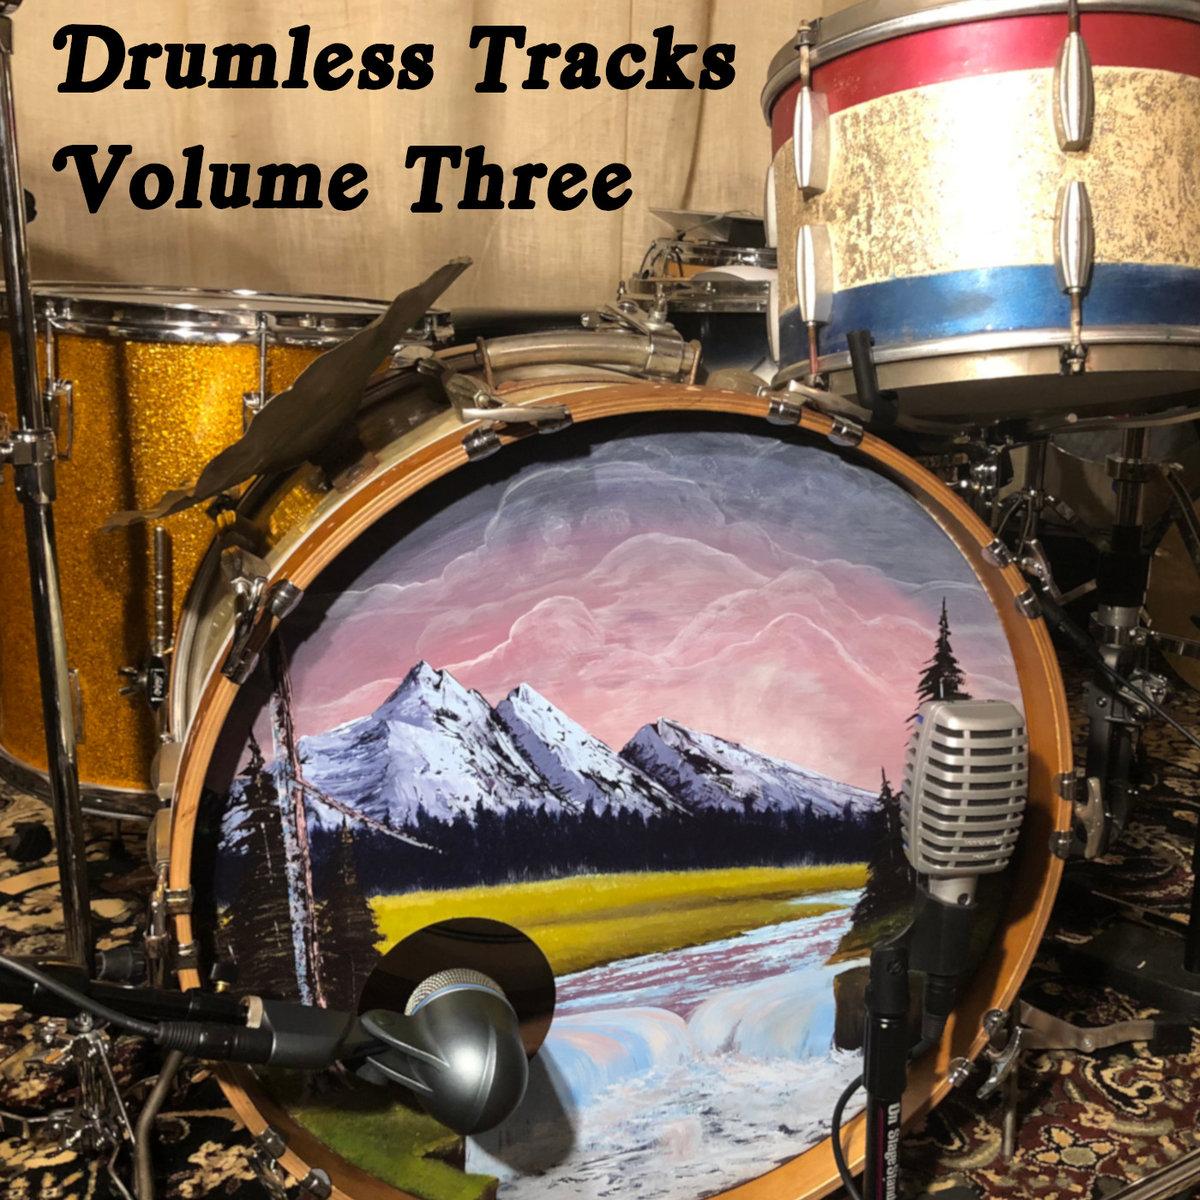 Drumless Tracks (Volume 3) | Sloux Recording Co